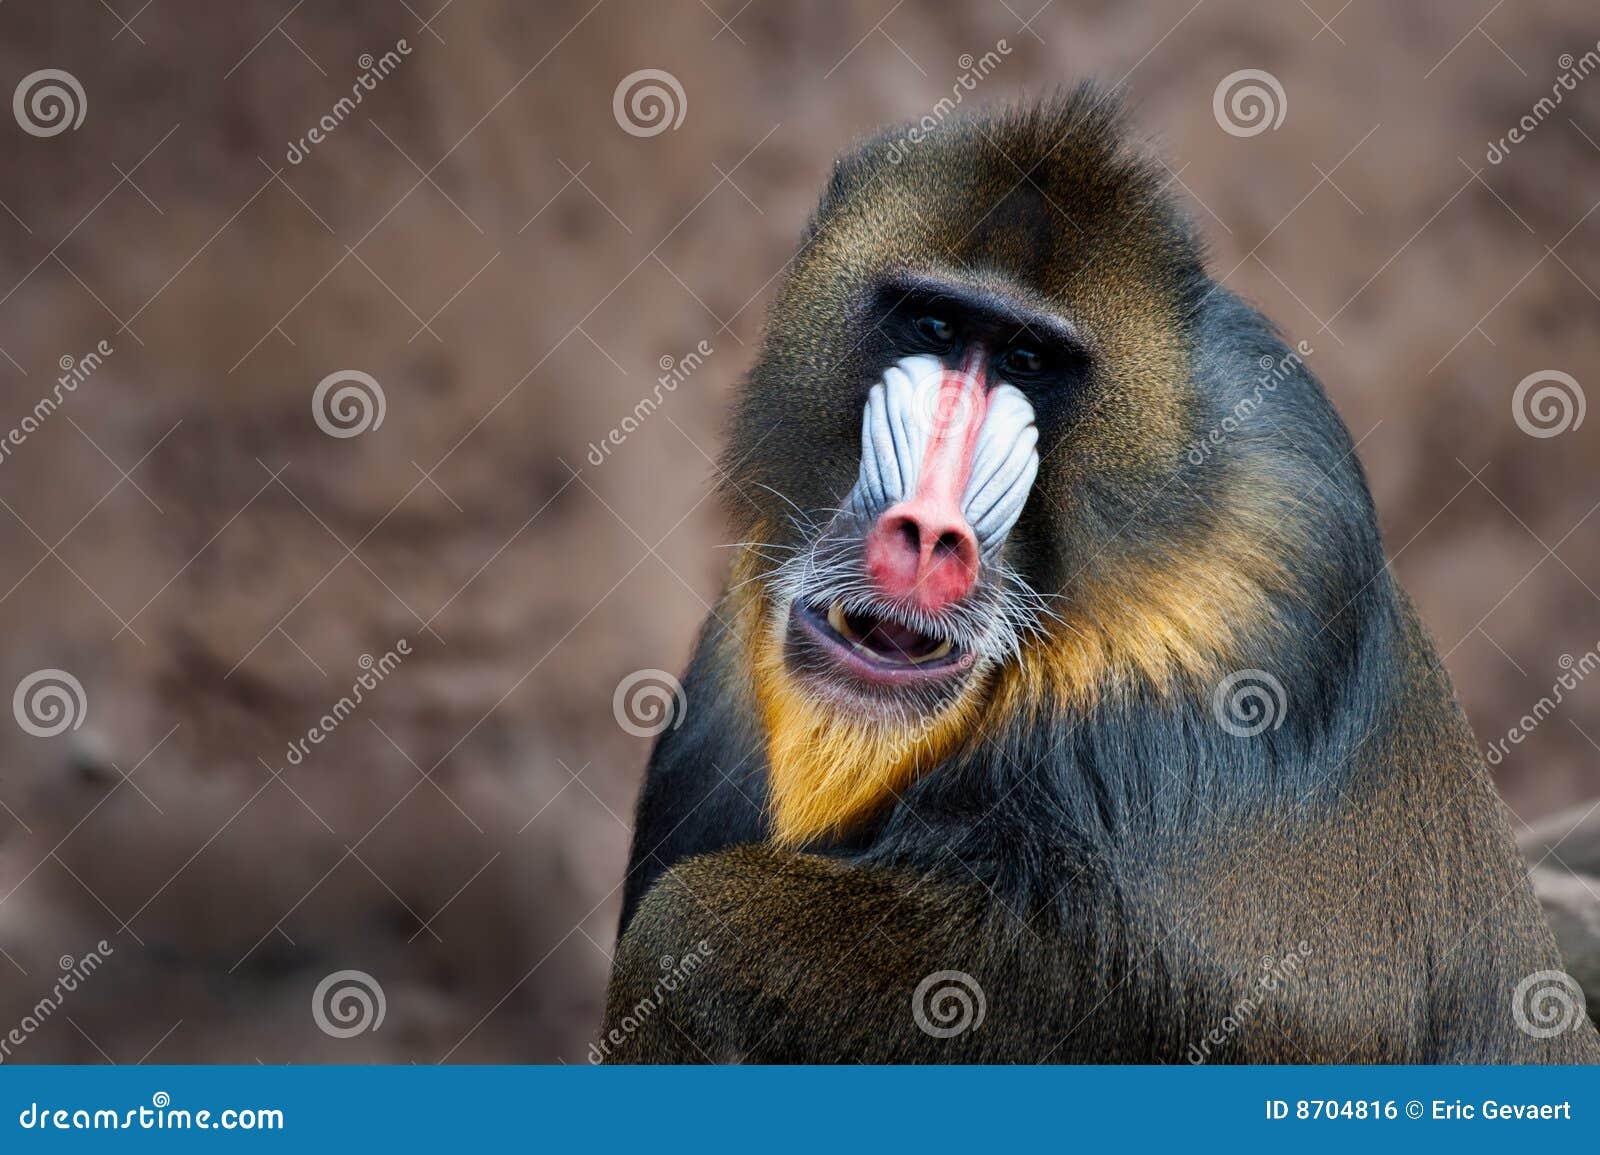 Colorful mandrill